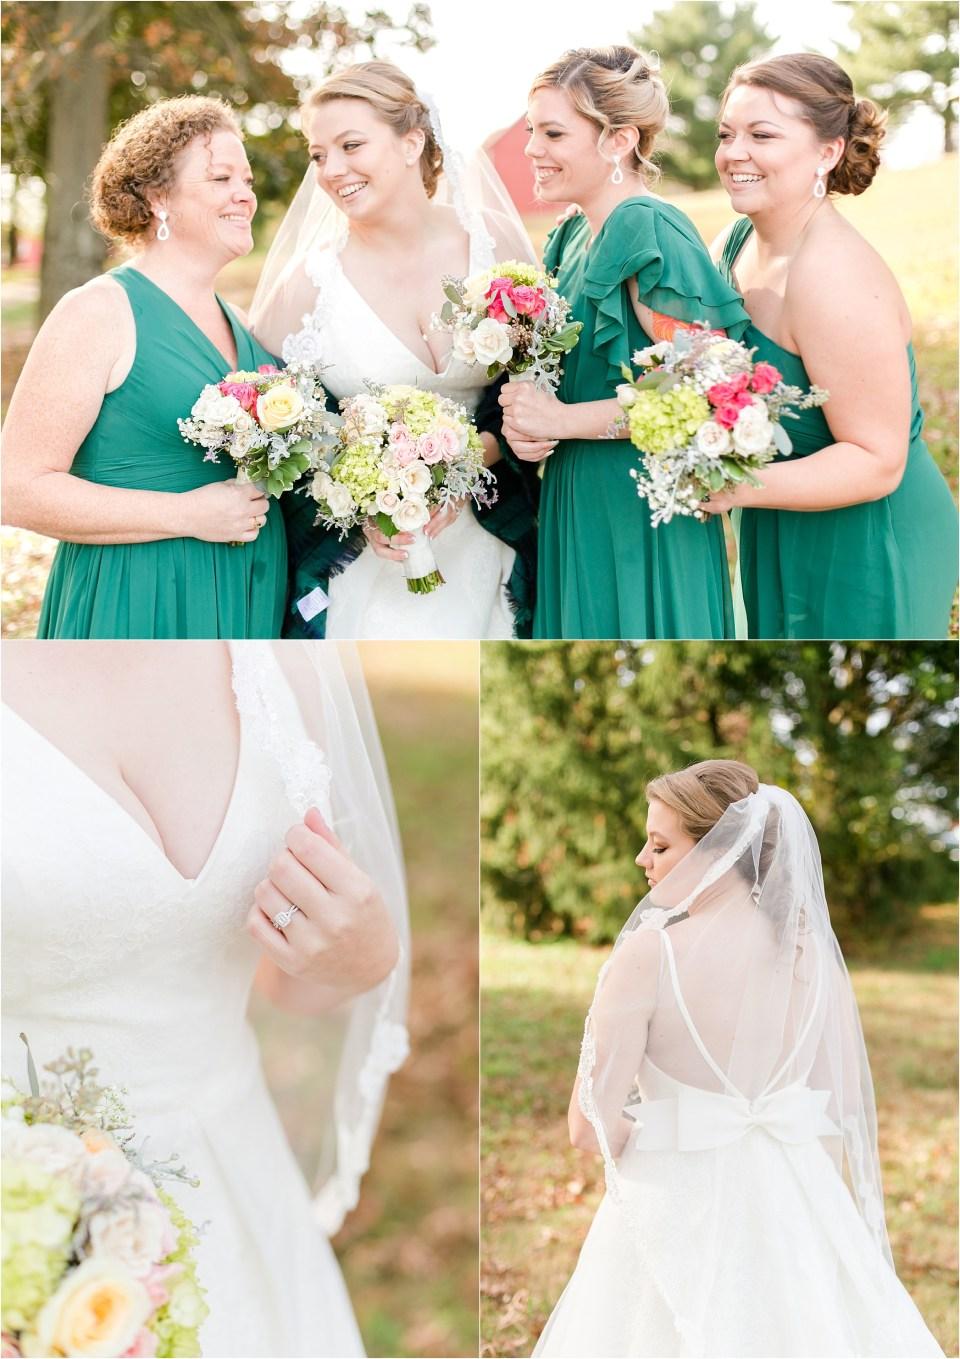 Robin Hill Farm and Vineyard Costola Maryland Wedding Photographer